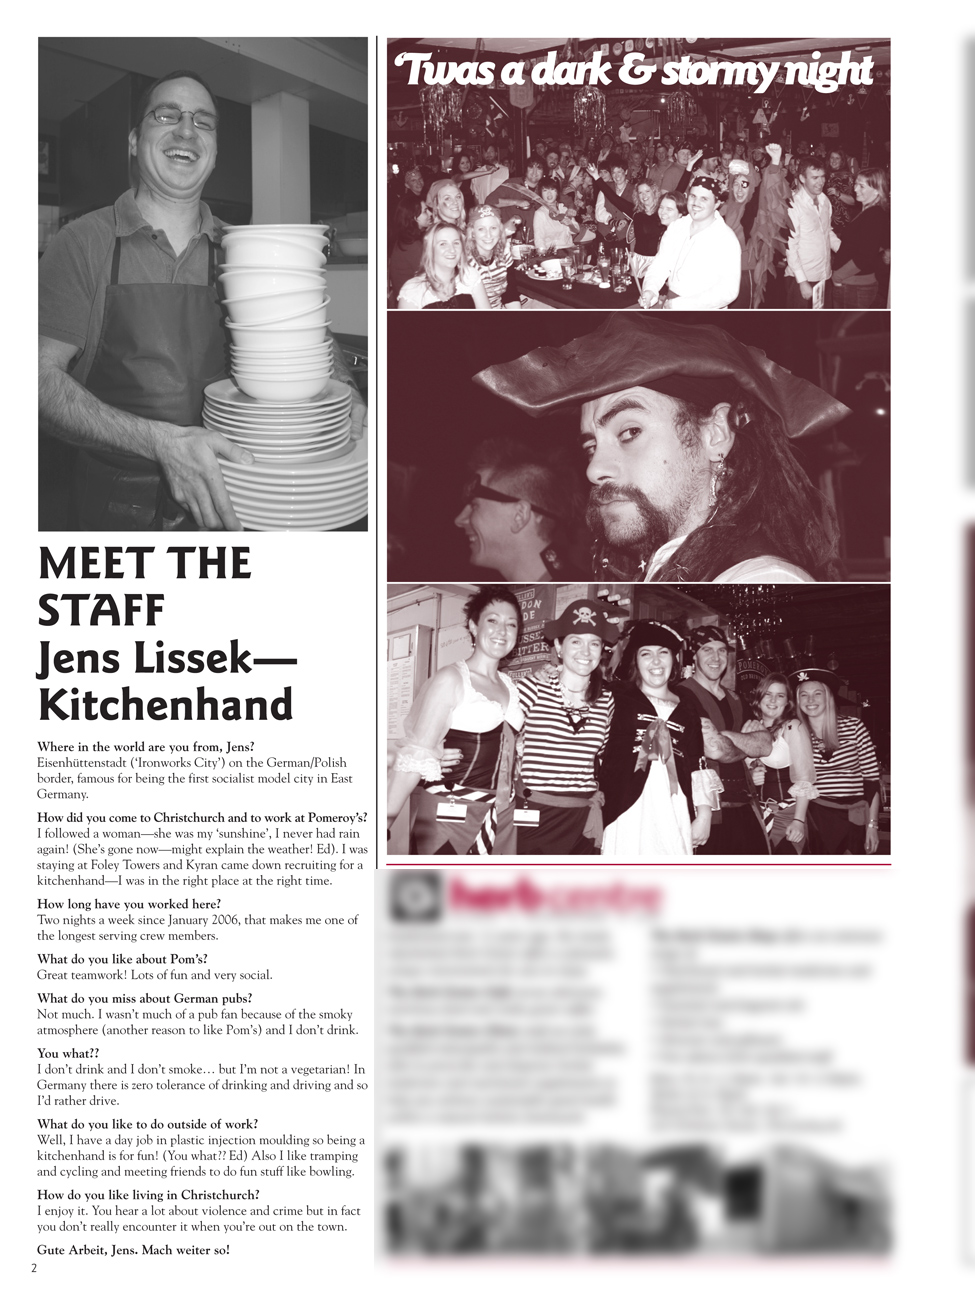 The Pomeroy's Press. Pom's Staff profile article. Jens Lissek.